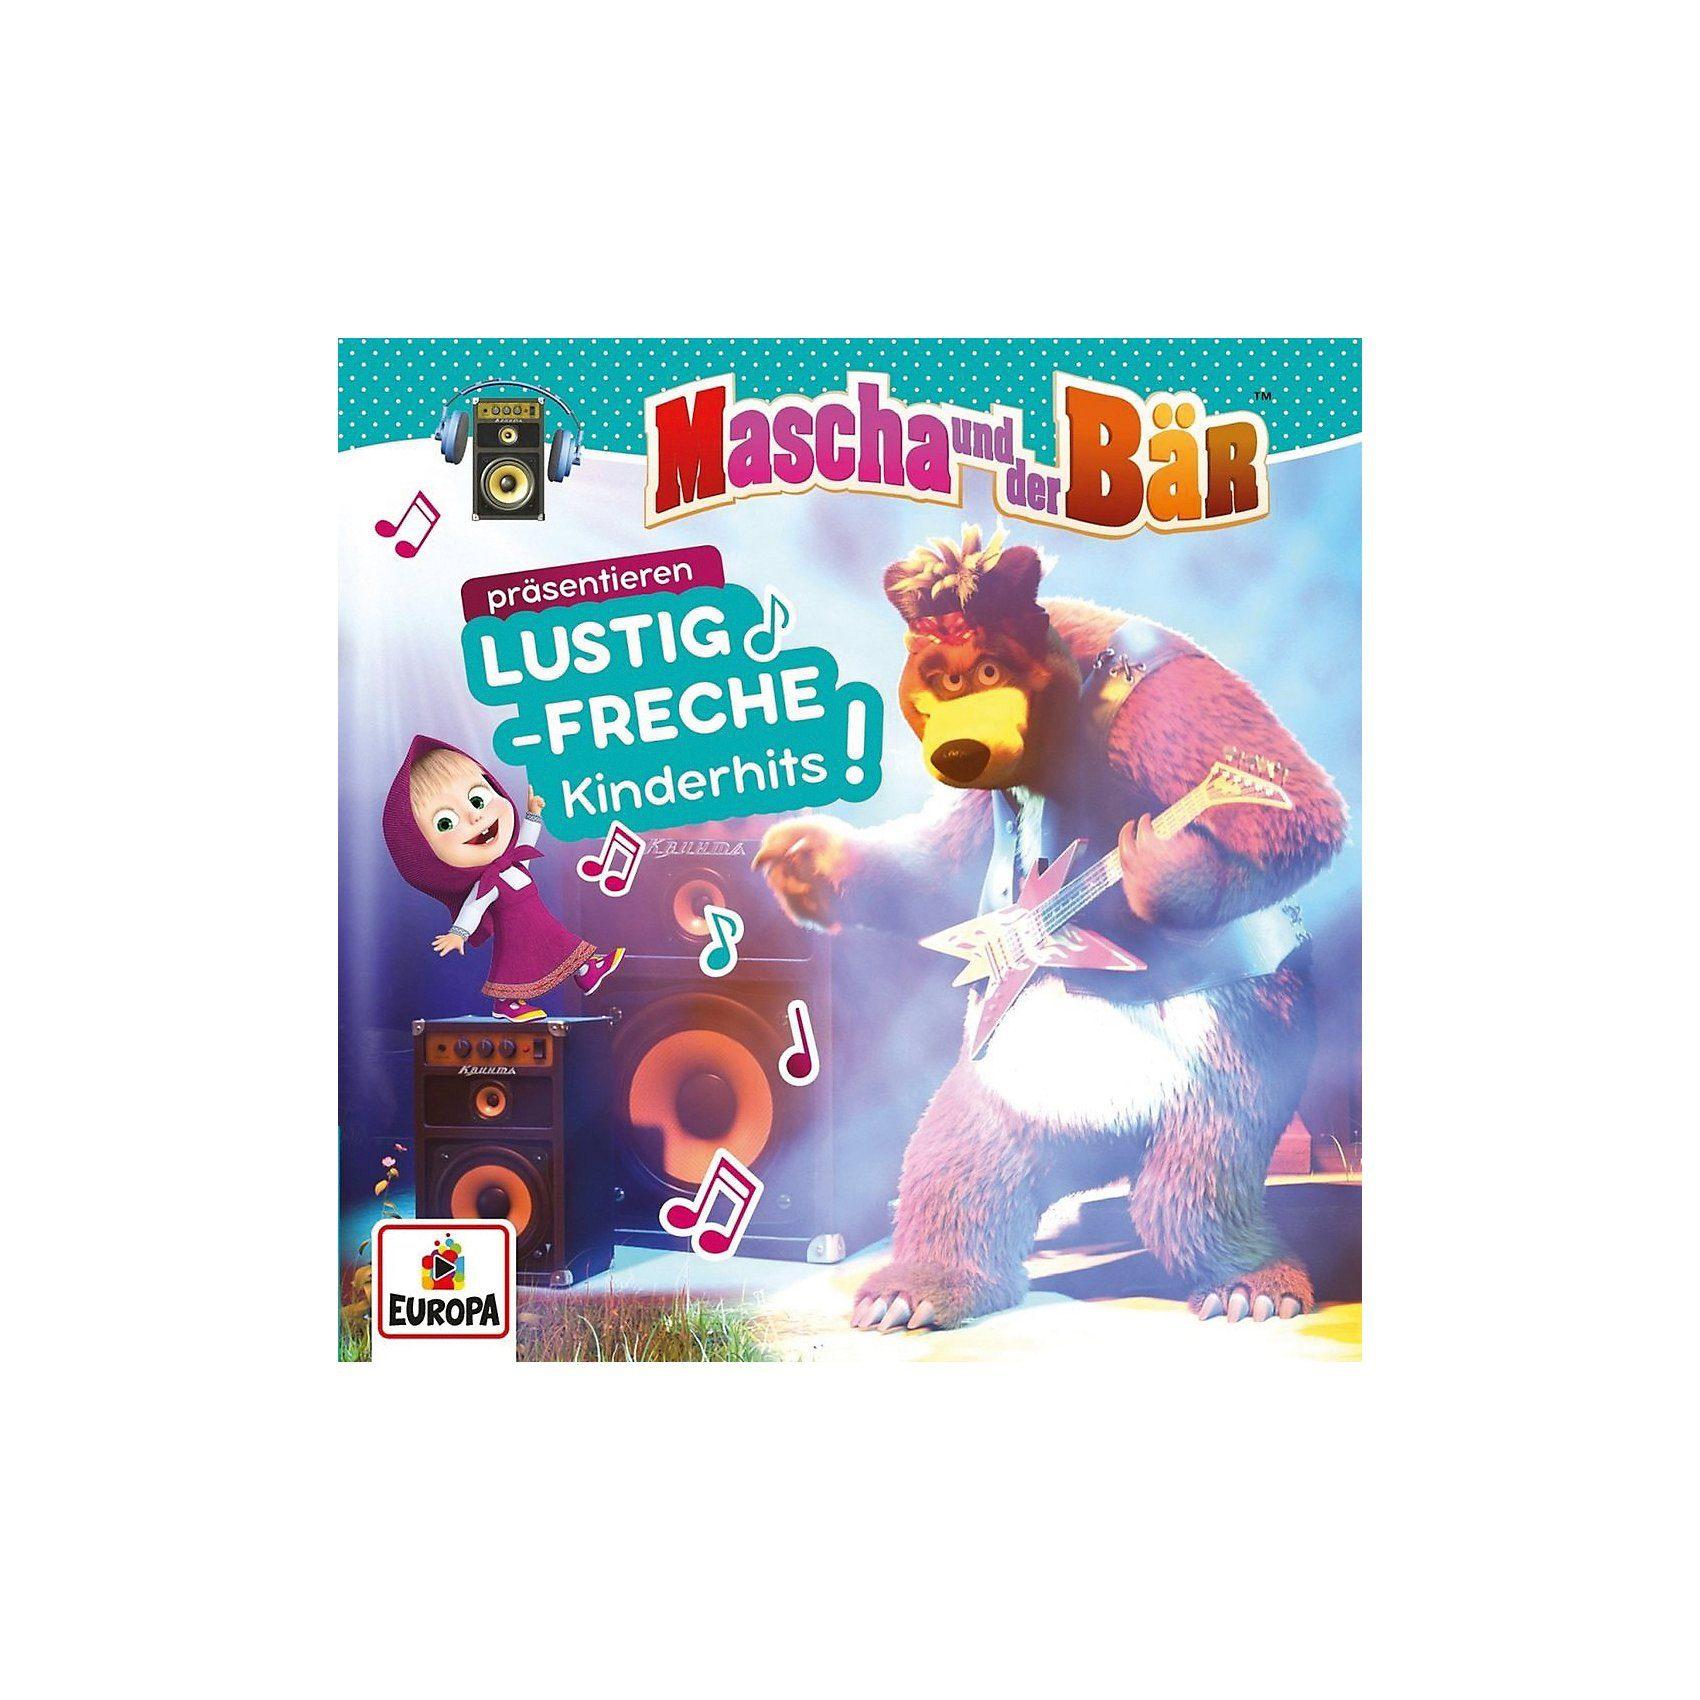 Sony CD Mascha & der Bär präsentieren lustig-freche Kinderhits